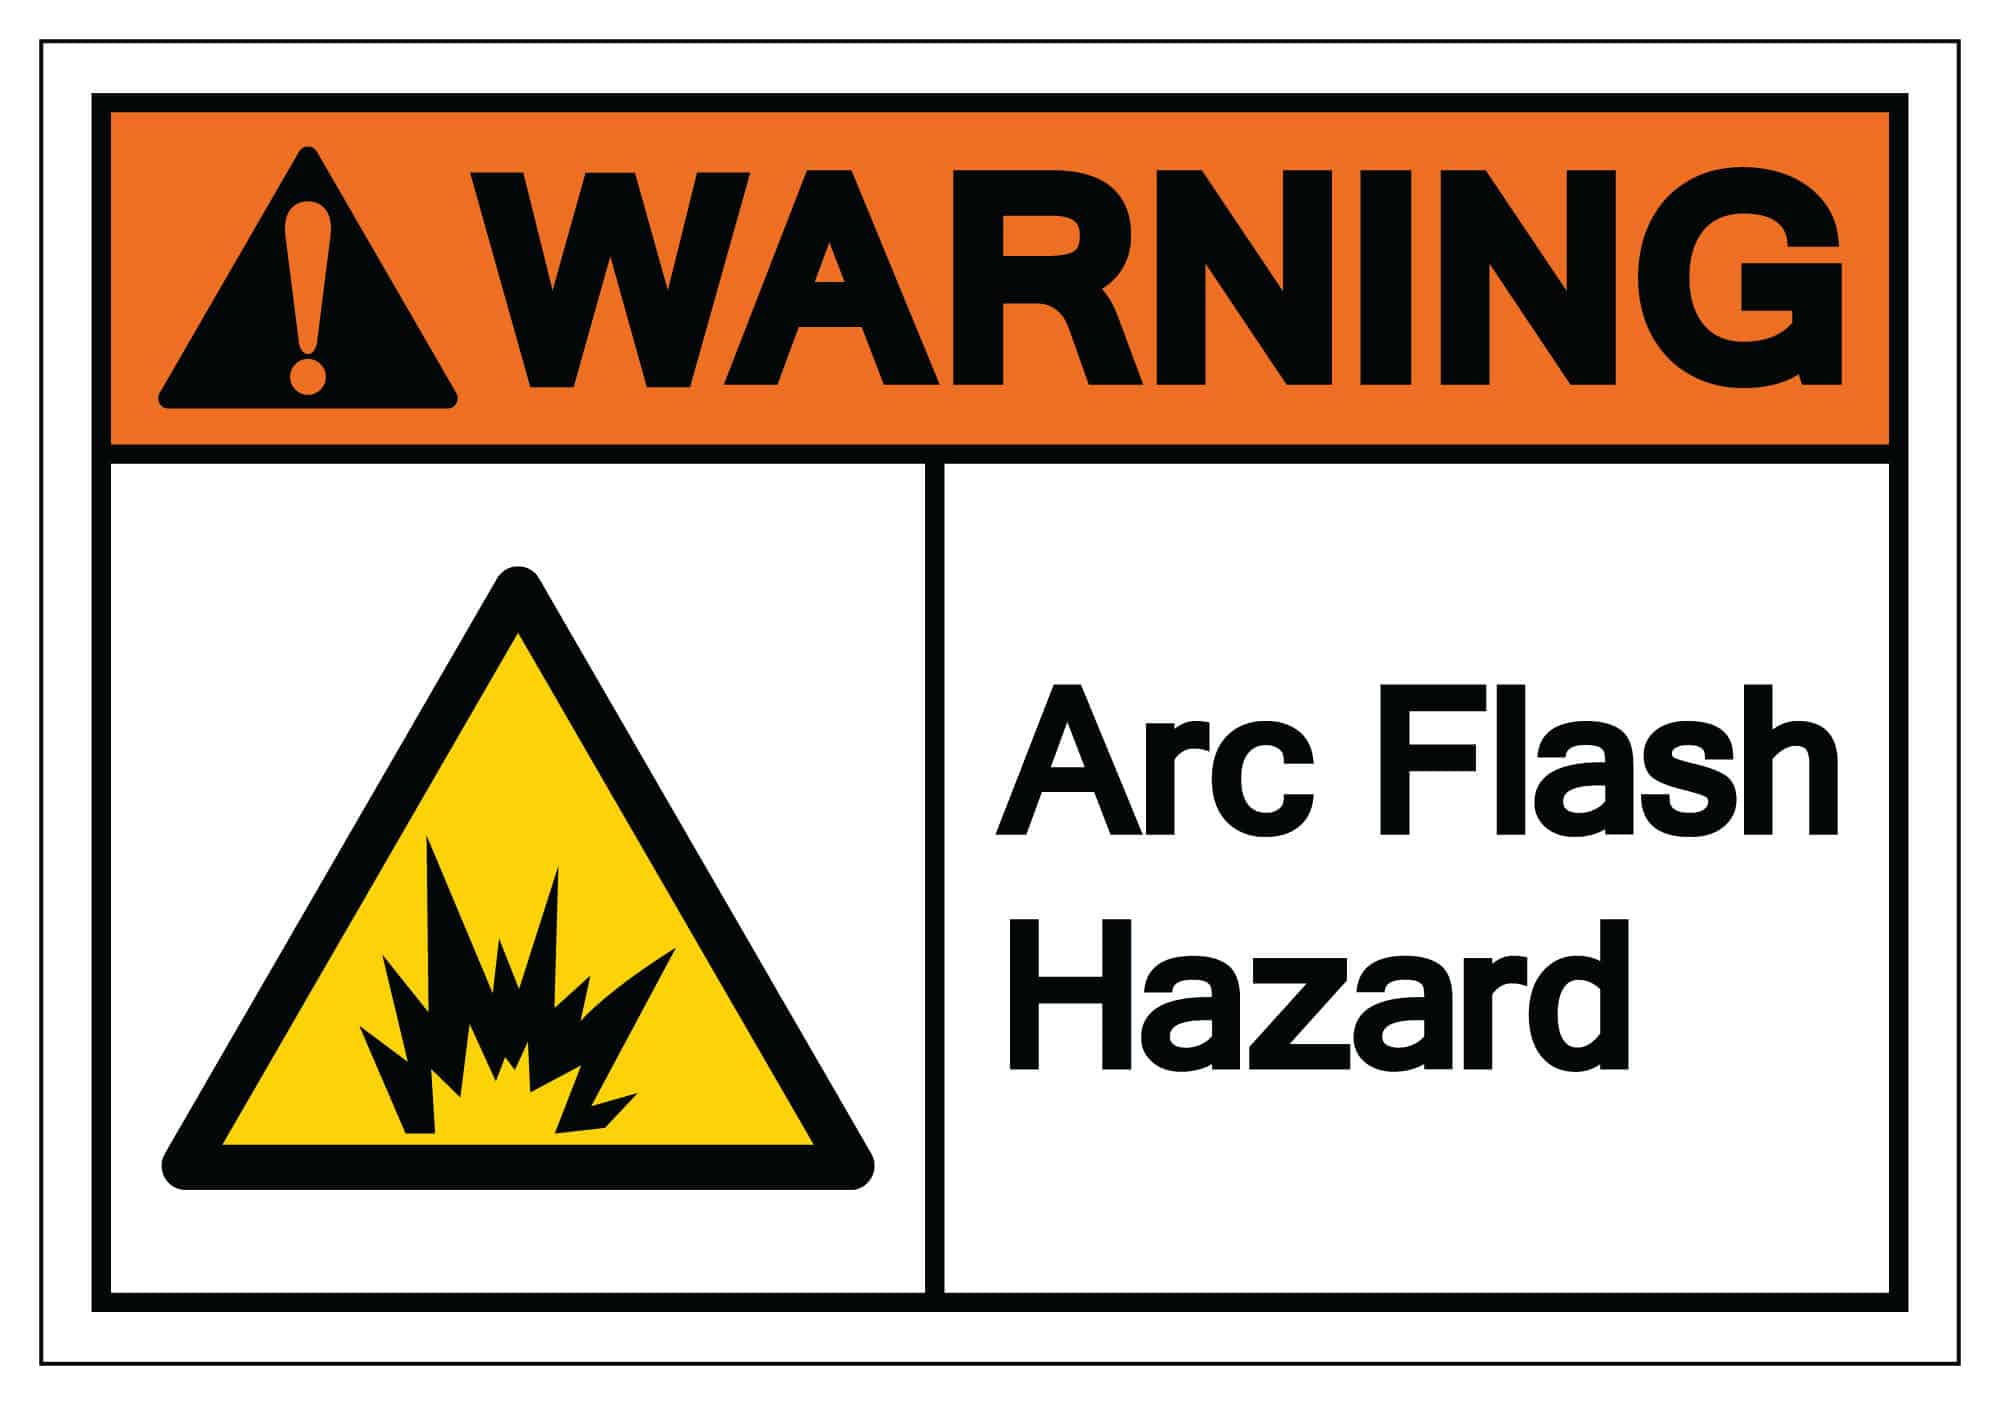 arc flash hazard